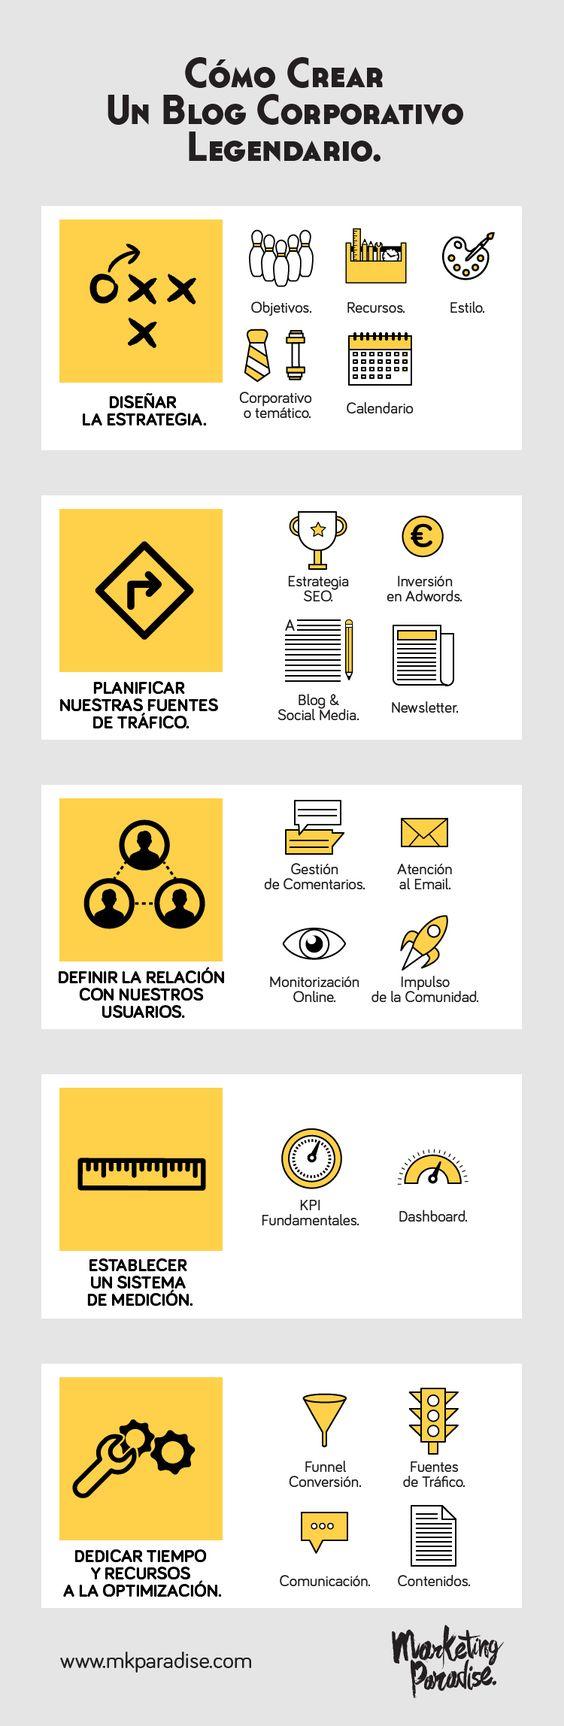 Cómo crear un Blog corporativo legendario #infografia #infographic #socialmedia